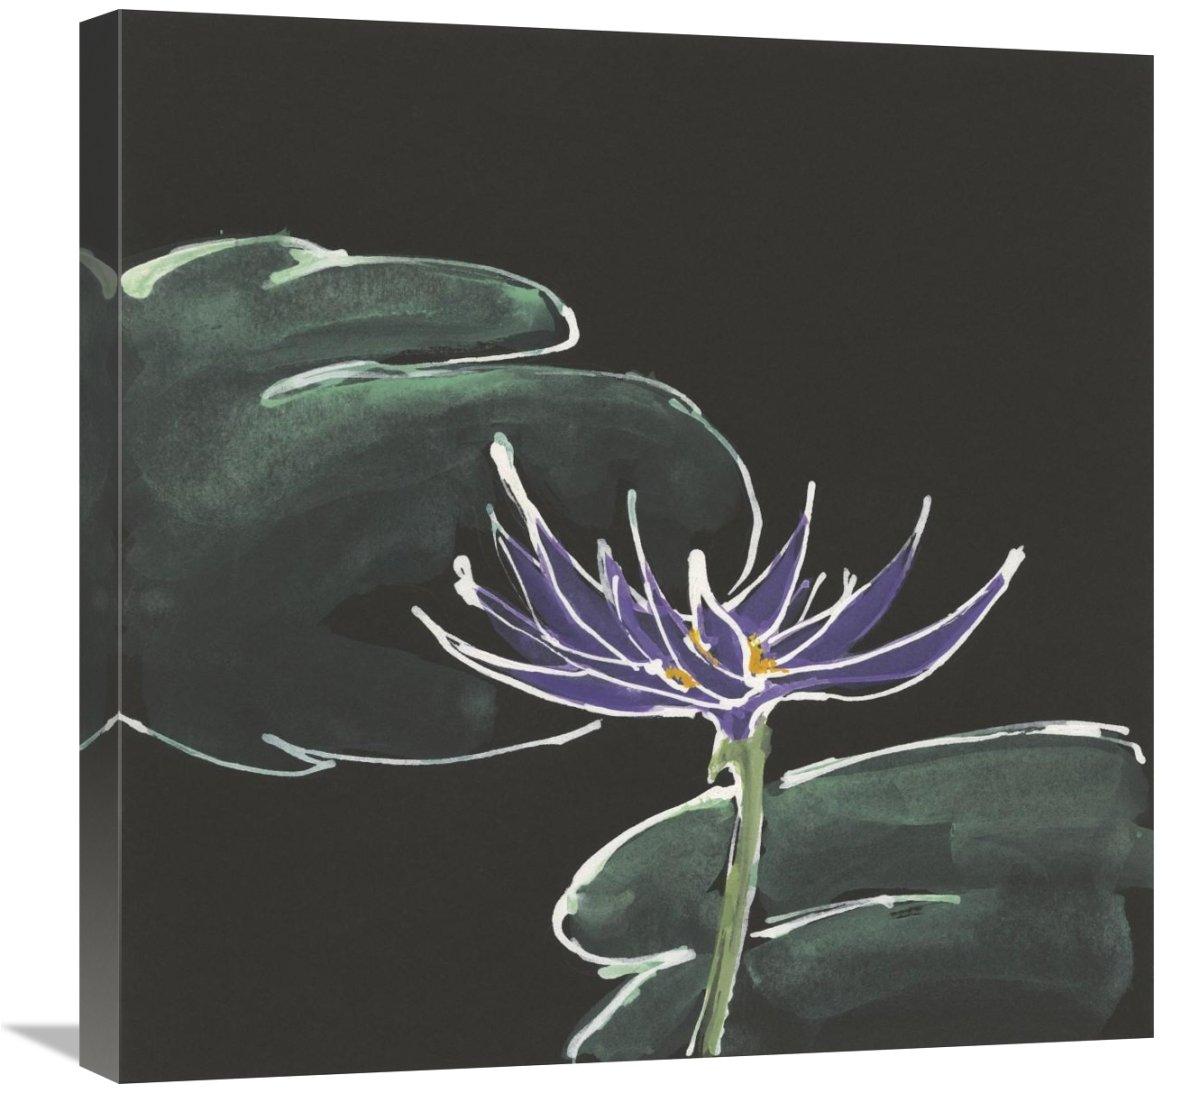 24 x 24 Lily on Black II Canvas Artwork Global Gallery Chris Paschke